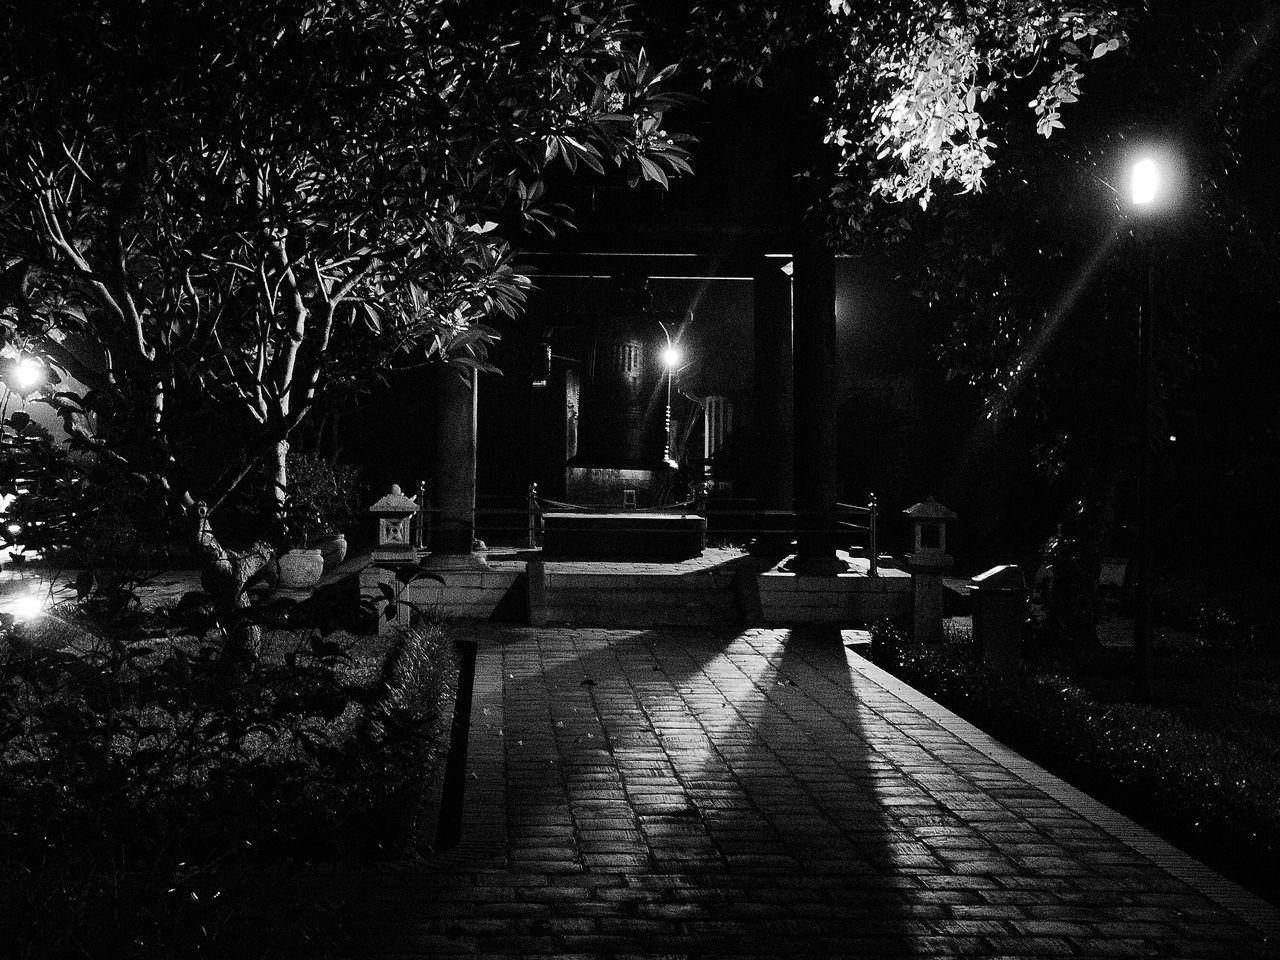 night, illuminated, tree, the way forward, outdoors, no people, nature, walkway